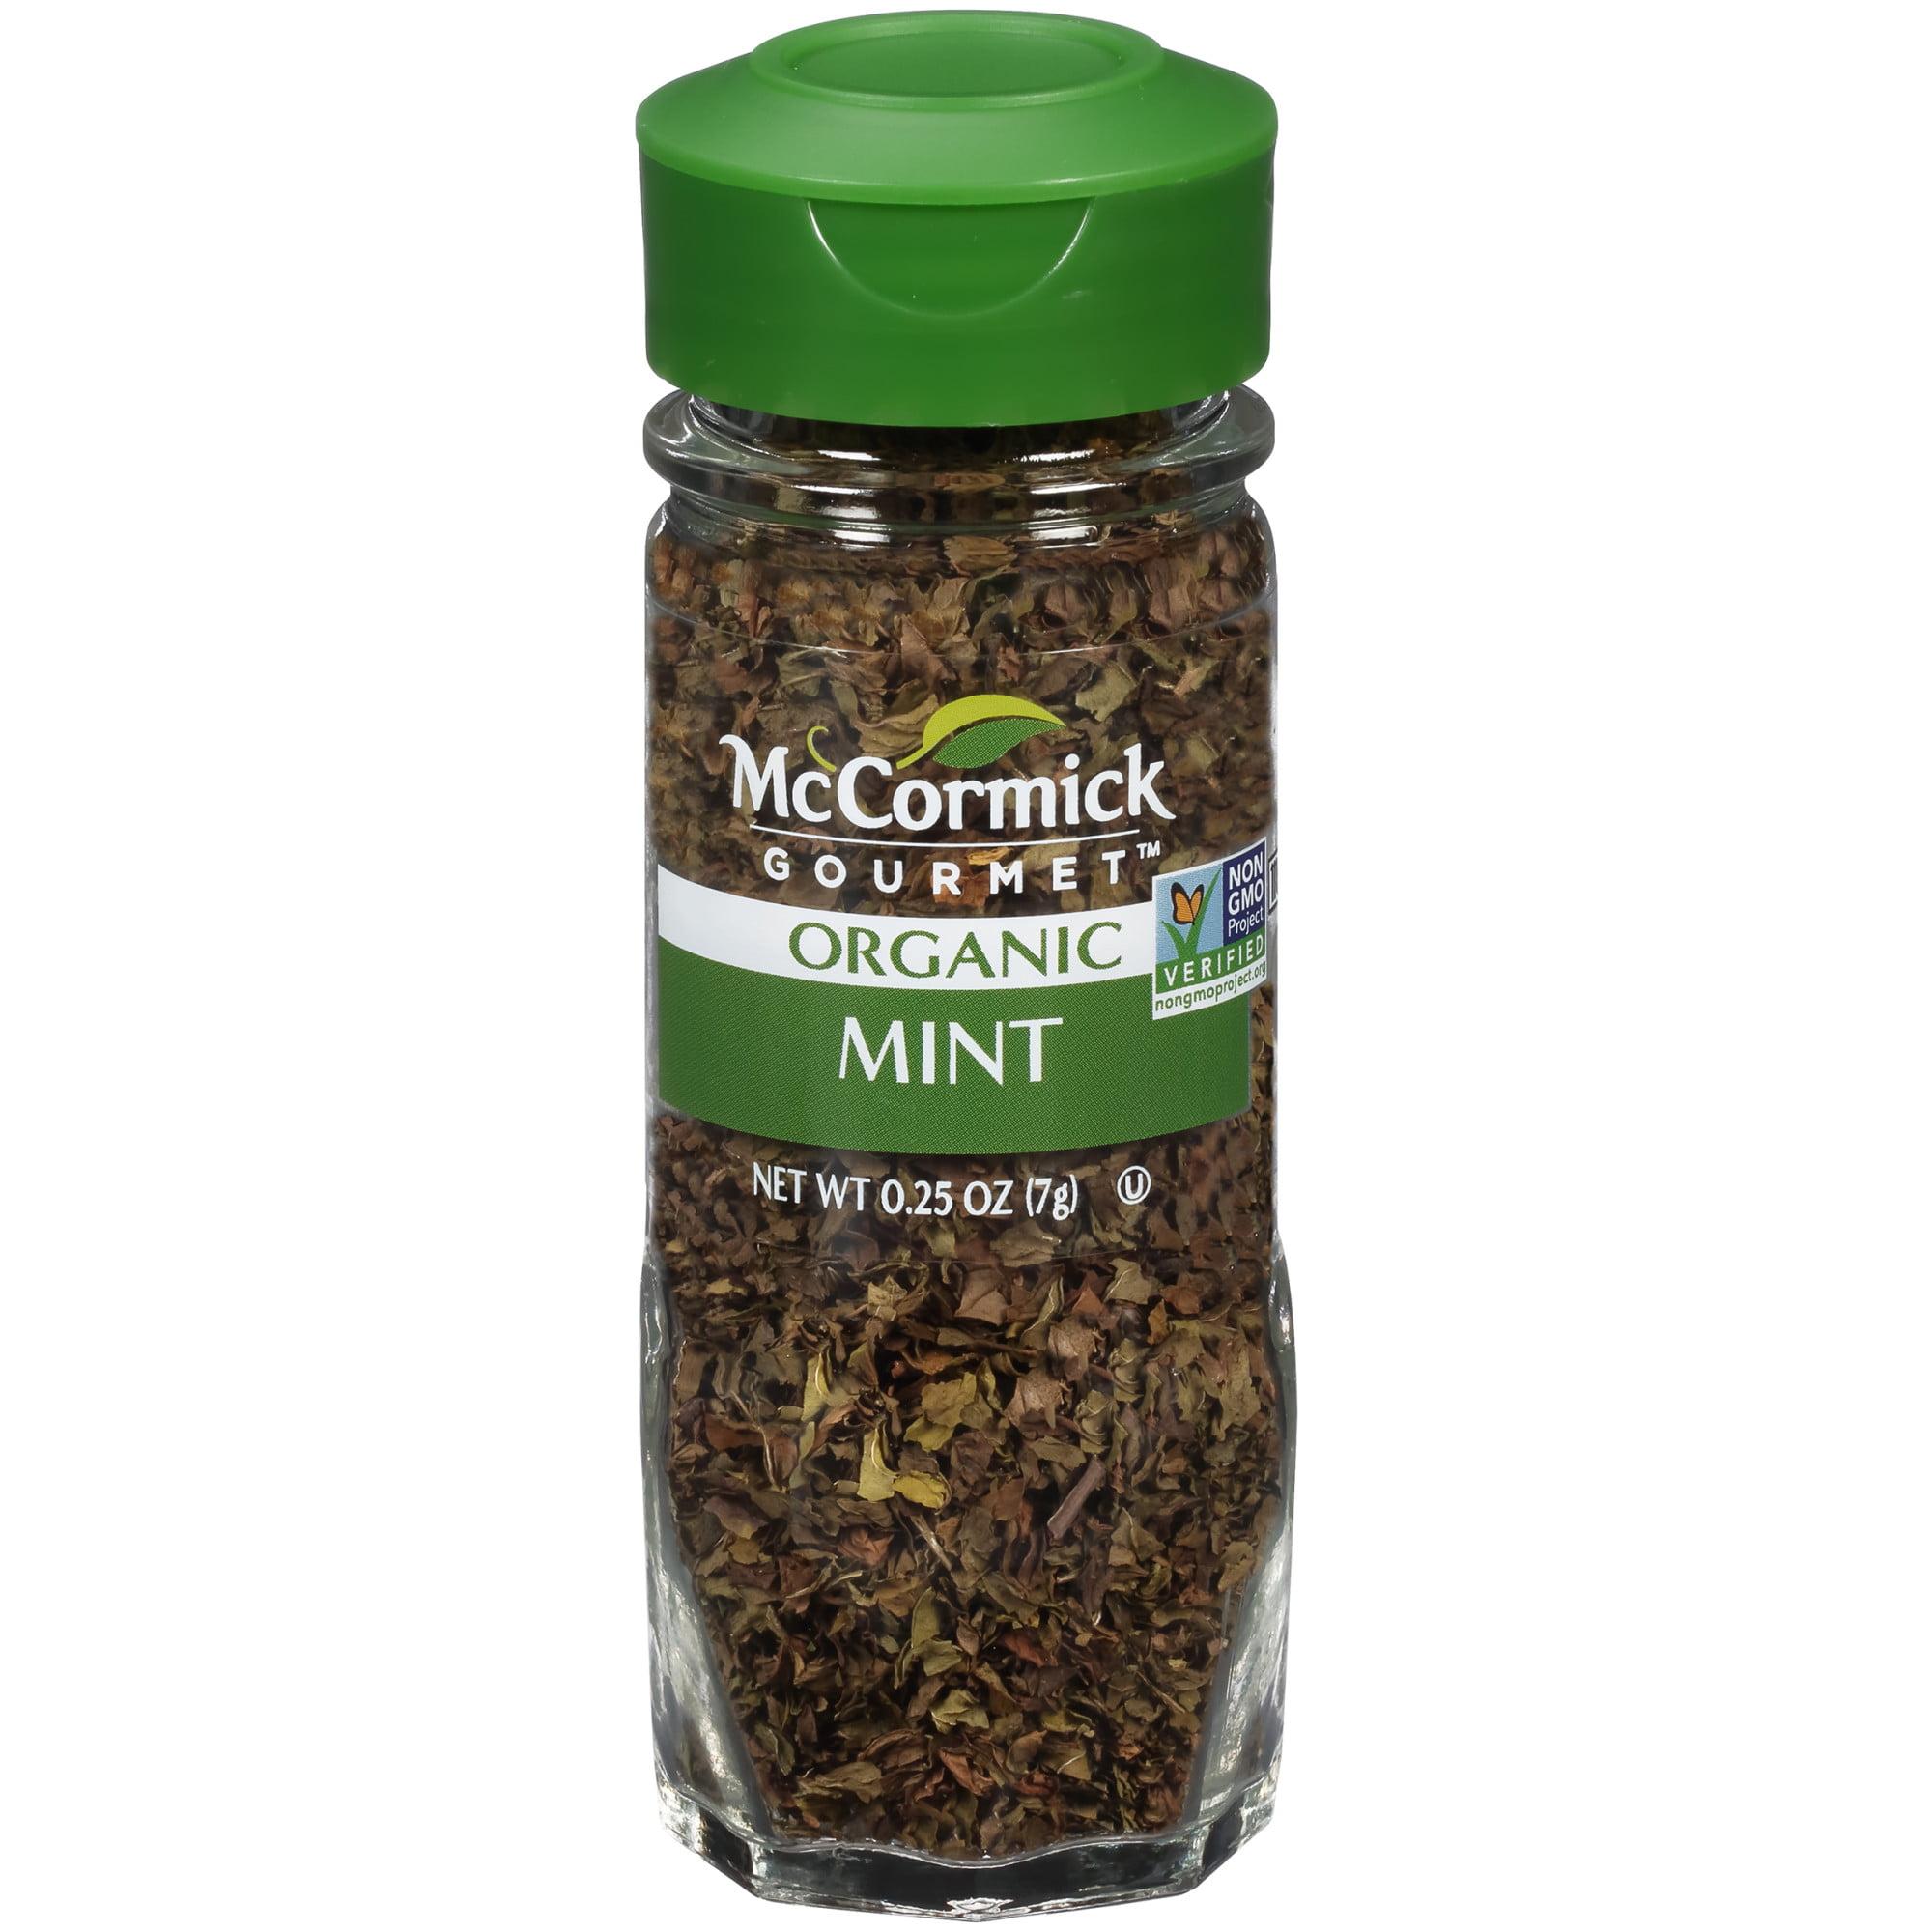 McCormick Gourmet Organic Mint, 0.25 oz